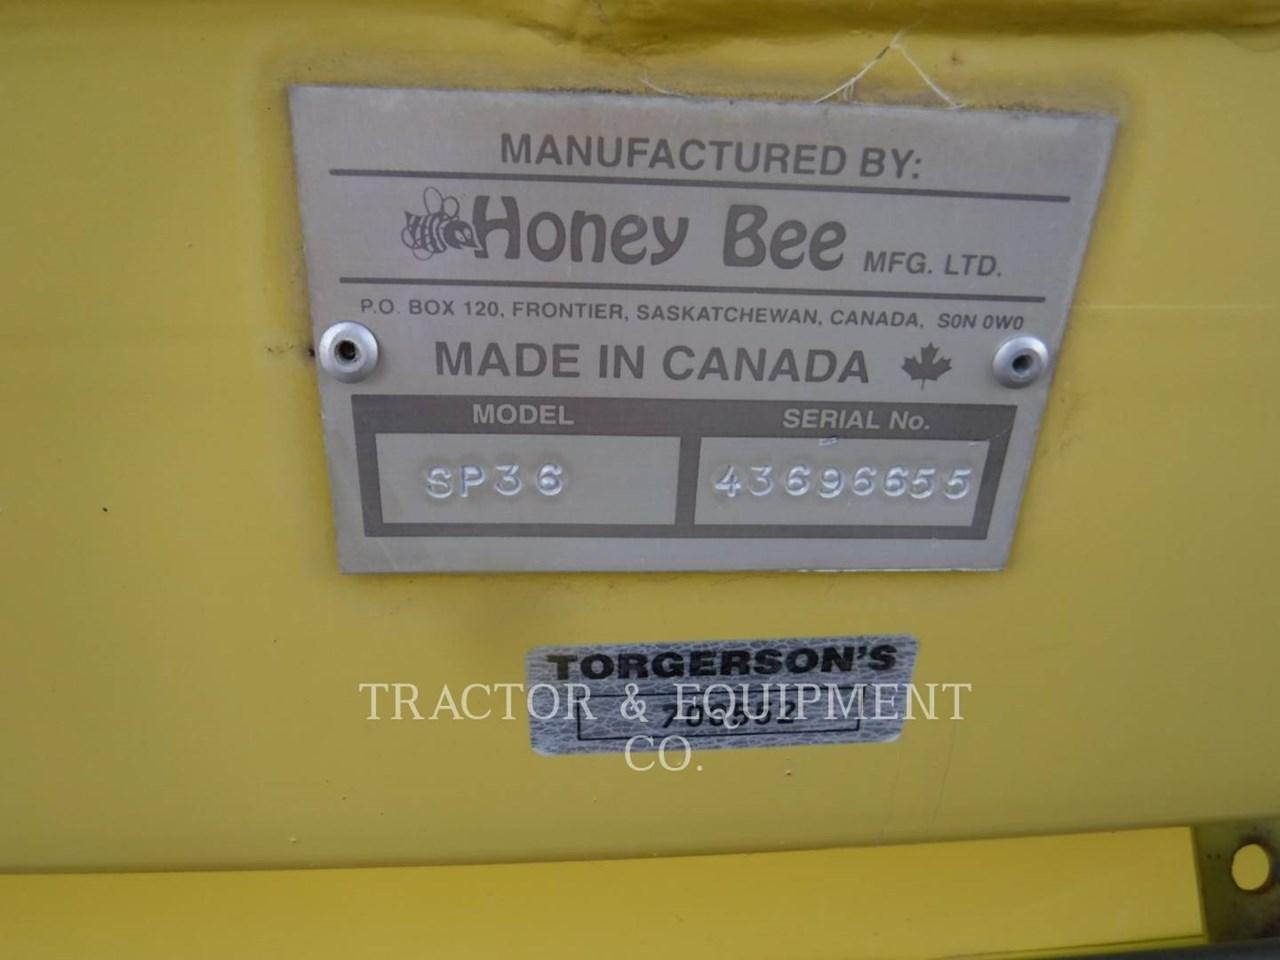 Honey Bee SP-36 Image 2